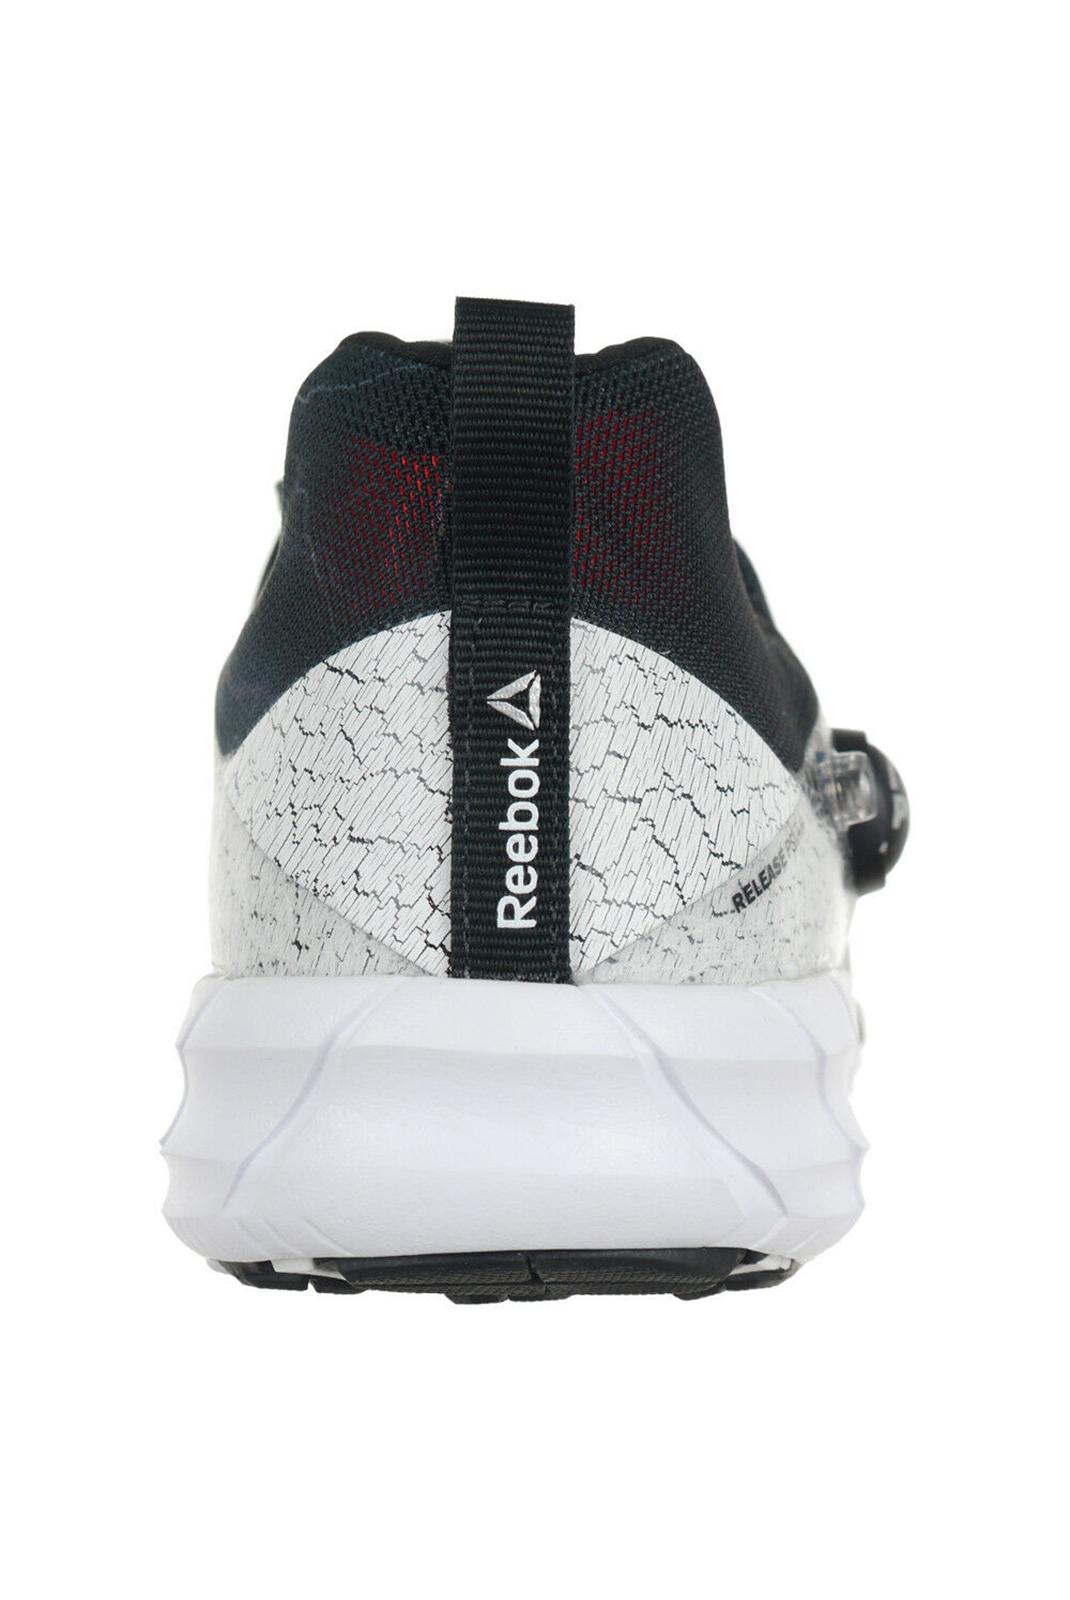 Baskets / Sneakers  Reebok V72399 ZPUMP FUSION 2.0 SP BLACK